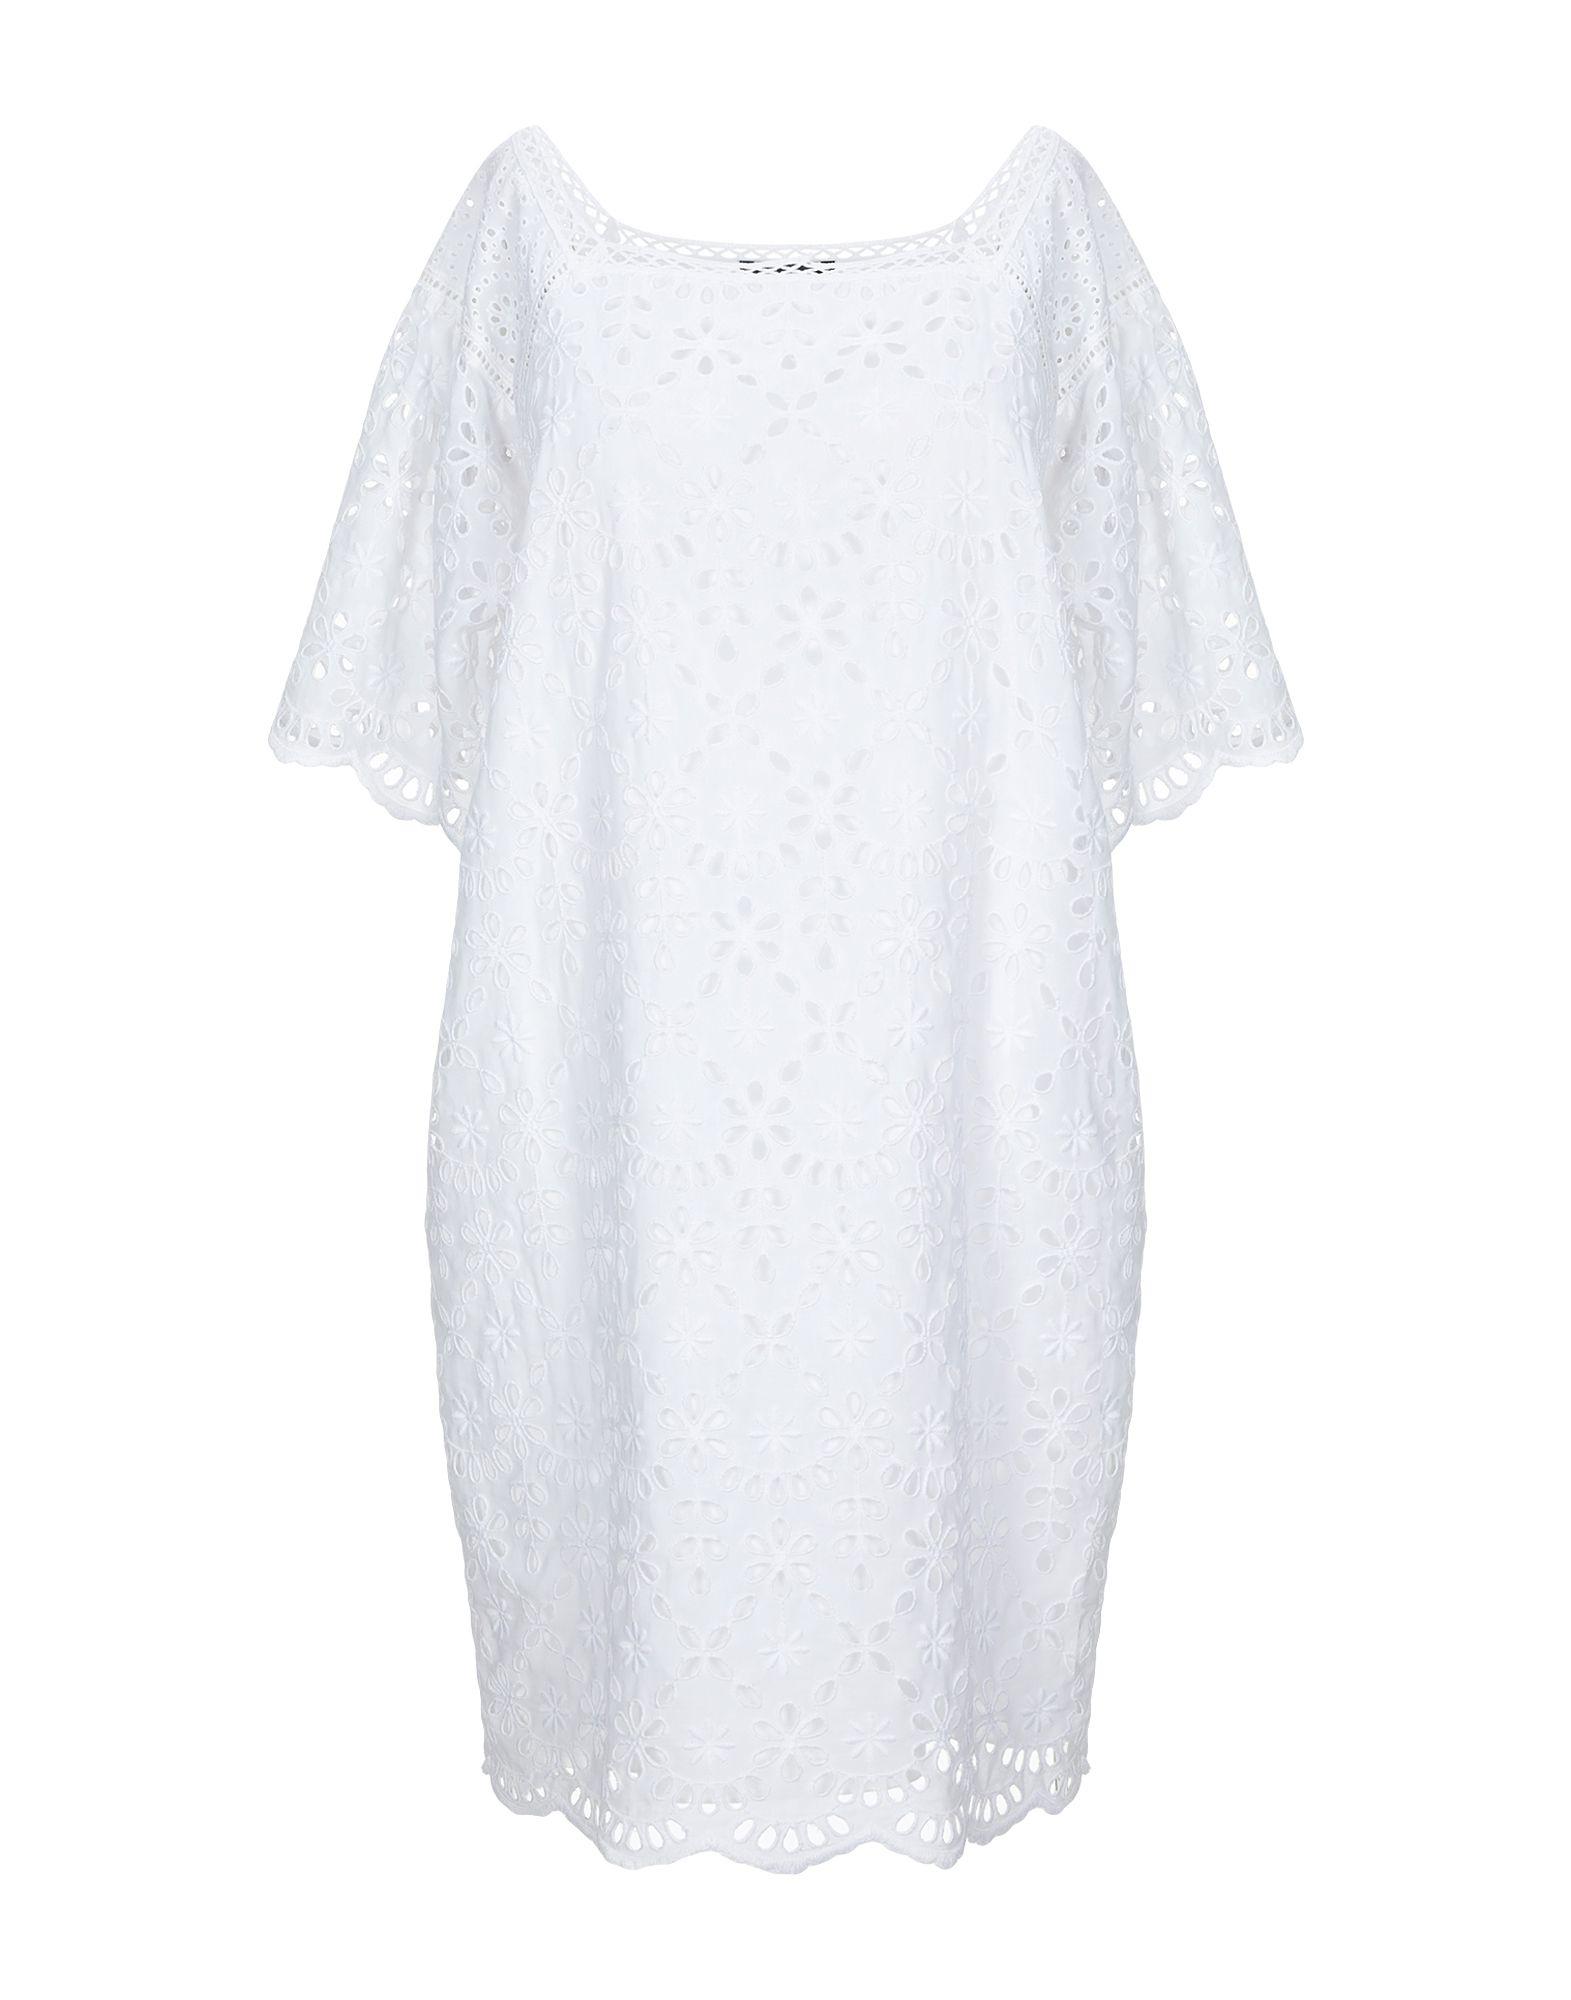 ERMANNO DI ERMANNO SCERVINO Короткое платье платье ermanno scervino платья и сарафаны приталенные